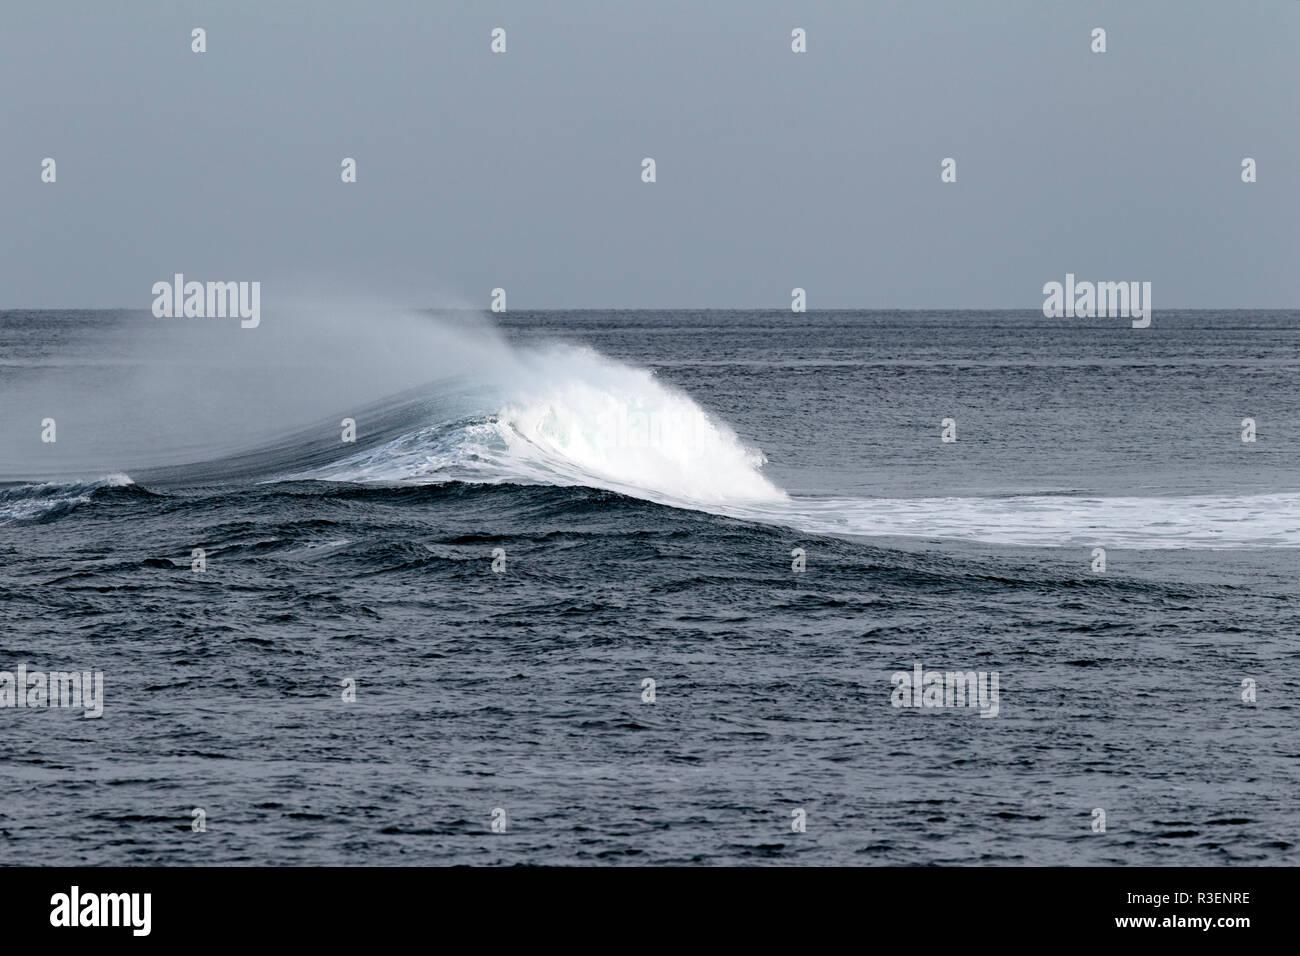 rogue wave building on the north antrim coast near Ballintoy county antrim northern ireland - Stock Image